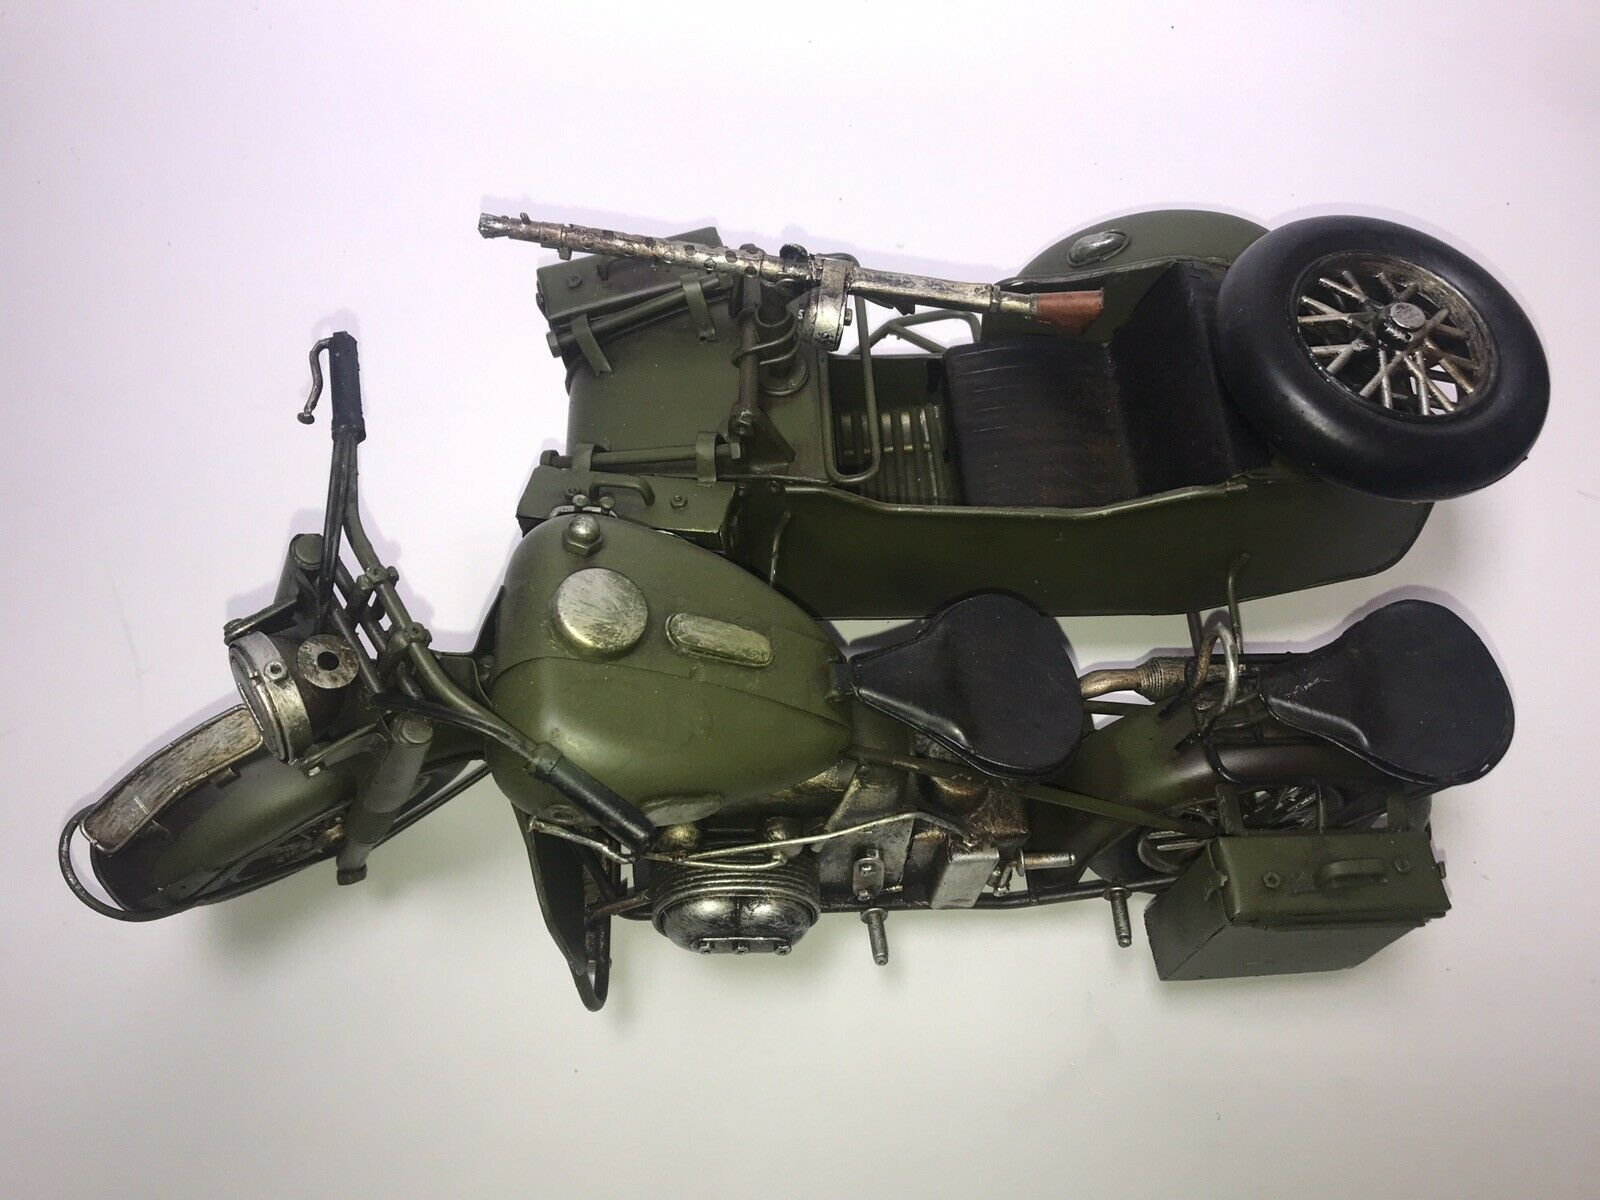 Maßstab 1 6 Blech BMW Motorrad Beiwagen MG MG Militär German Military Motorcycle